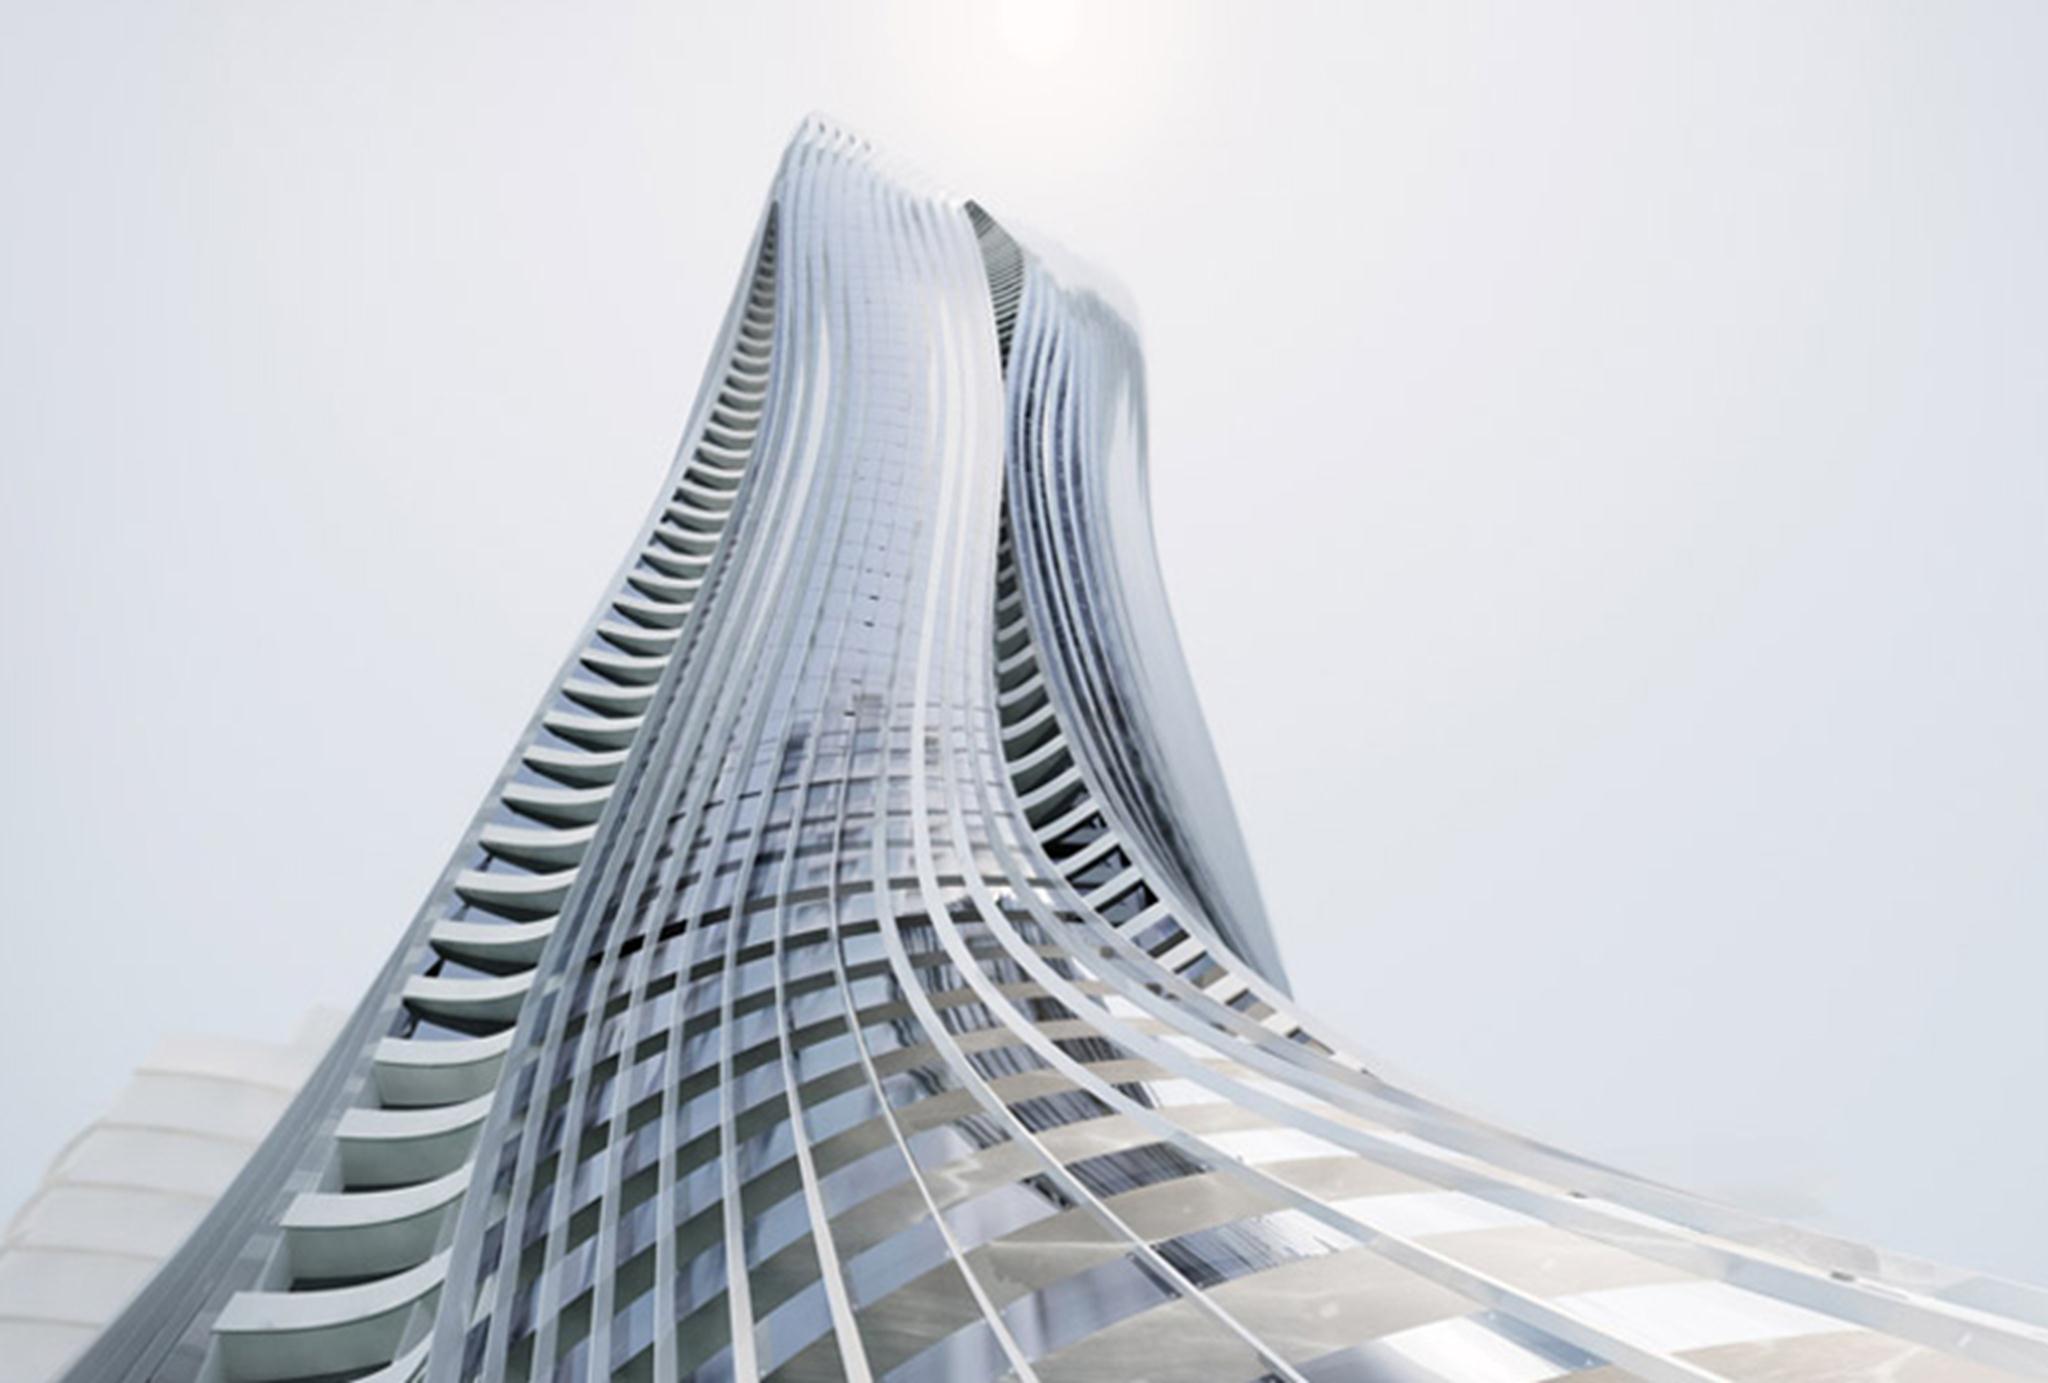 michael schumacher tower 2